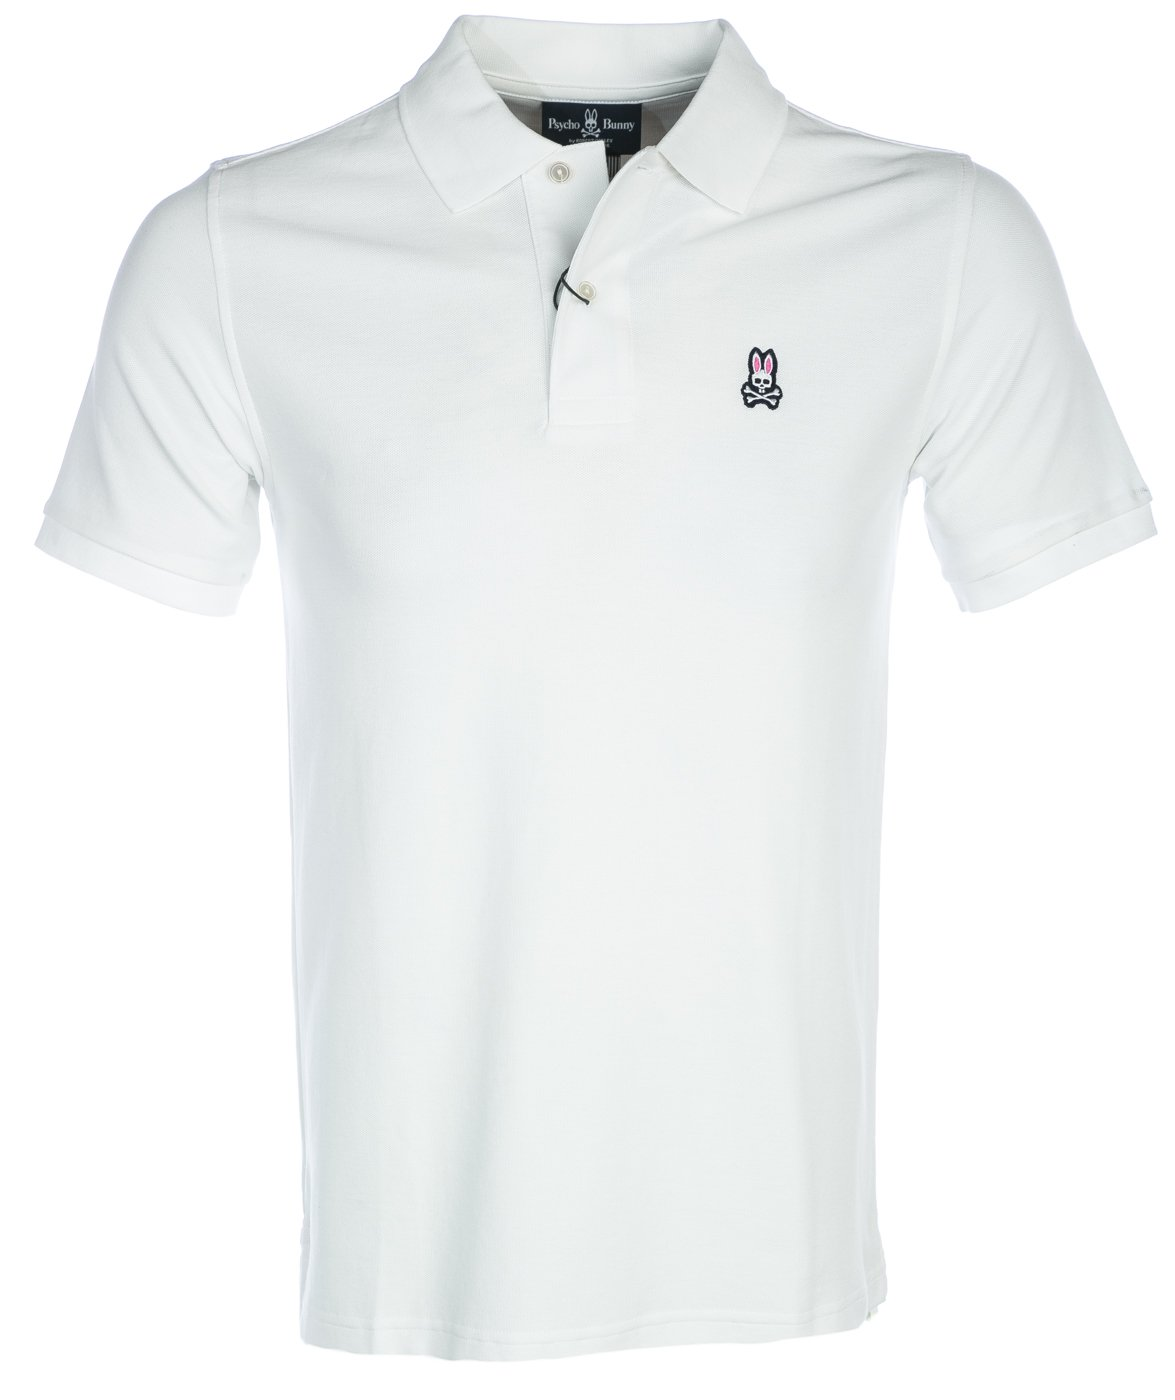 Psycho Bunny(サイコバニー) ポロシャツ Classic Polo 半袖 ゴルフ メンズ 男性用 [並行輸入品] B06XH1KMWR 3L ホワイト ホワイト 3L